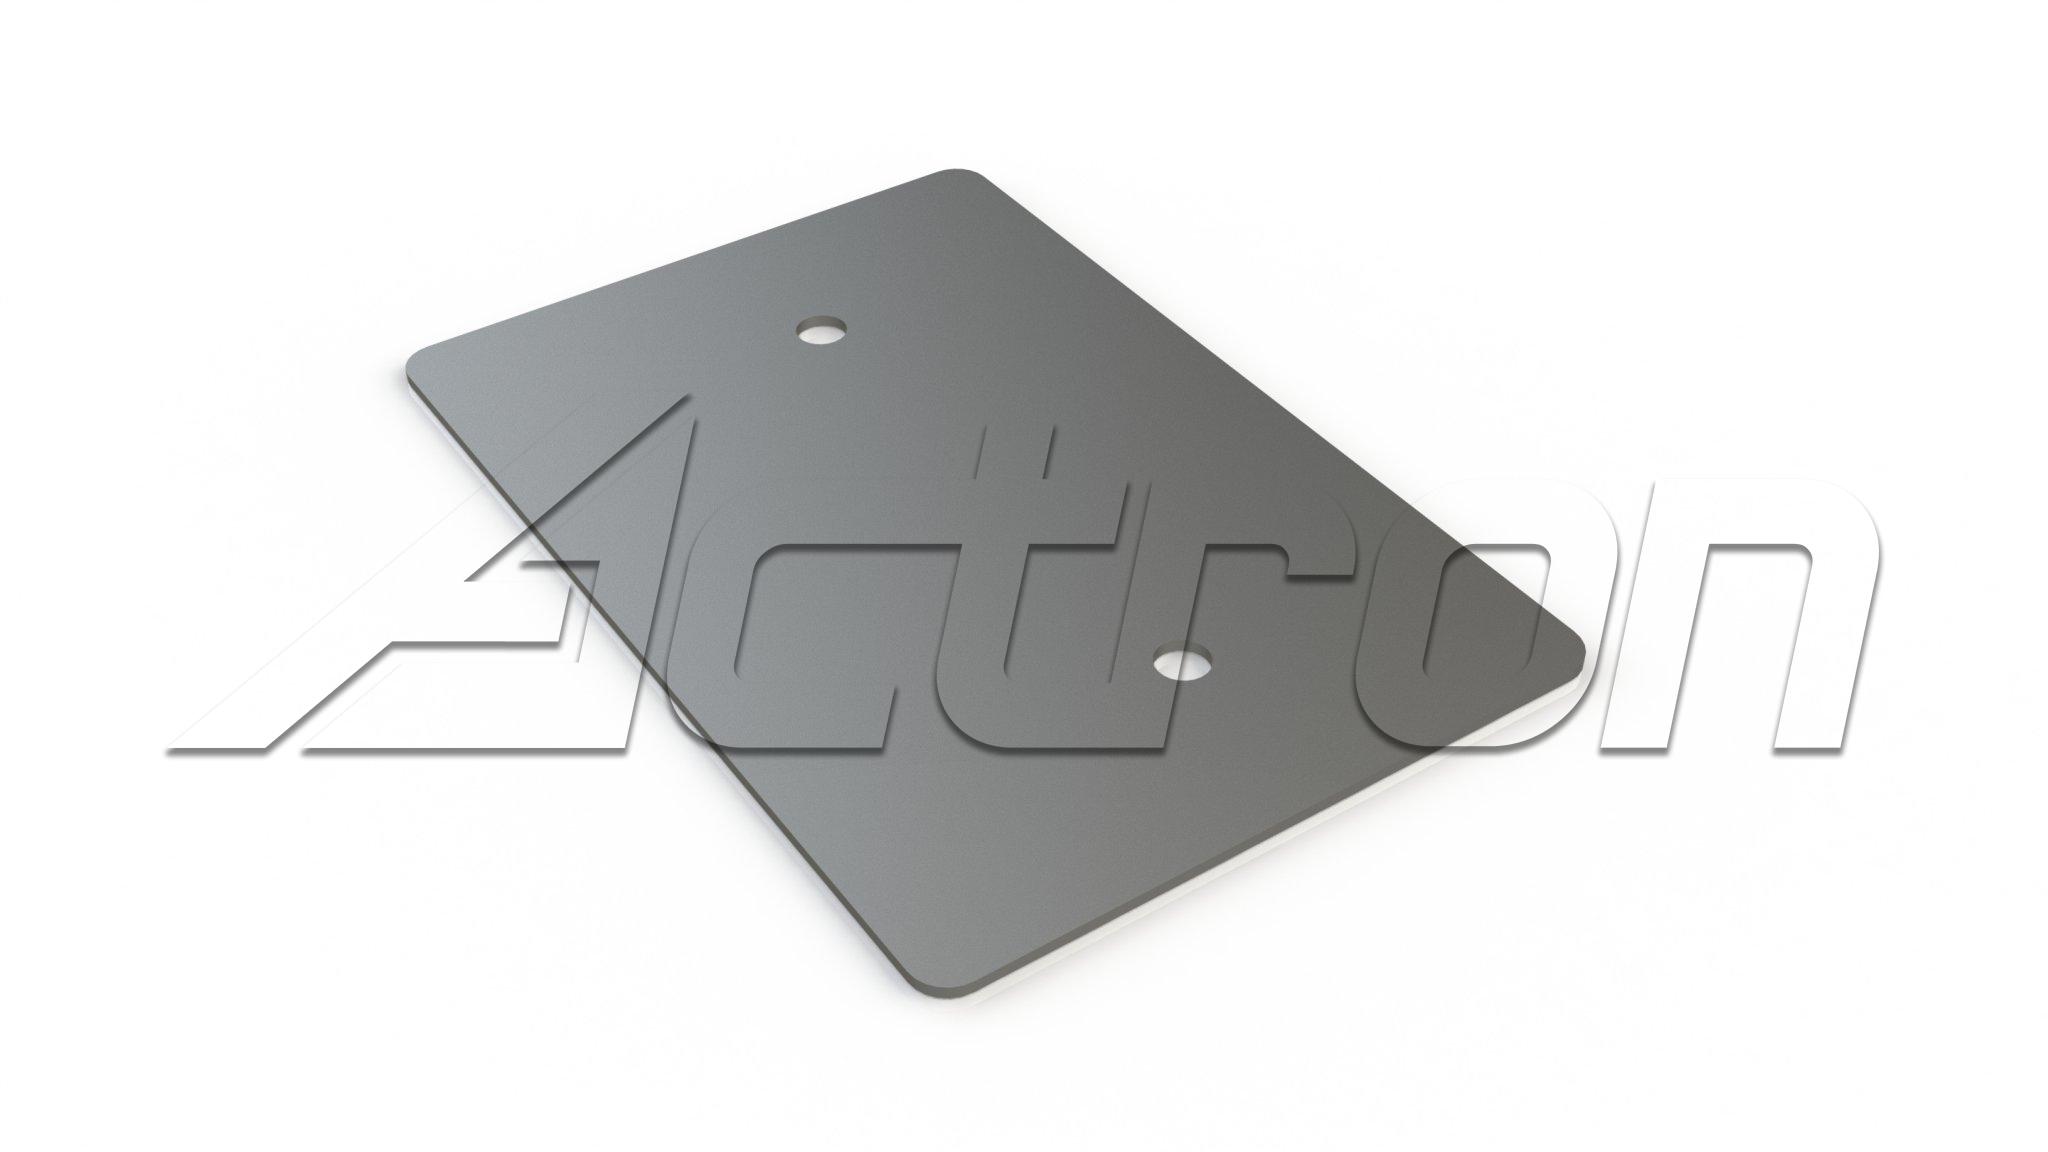 mounting-plate-8211-latch-5276-a43015.jpg